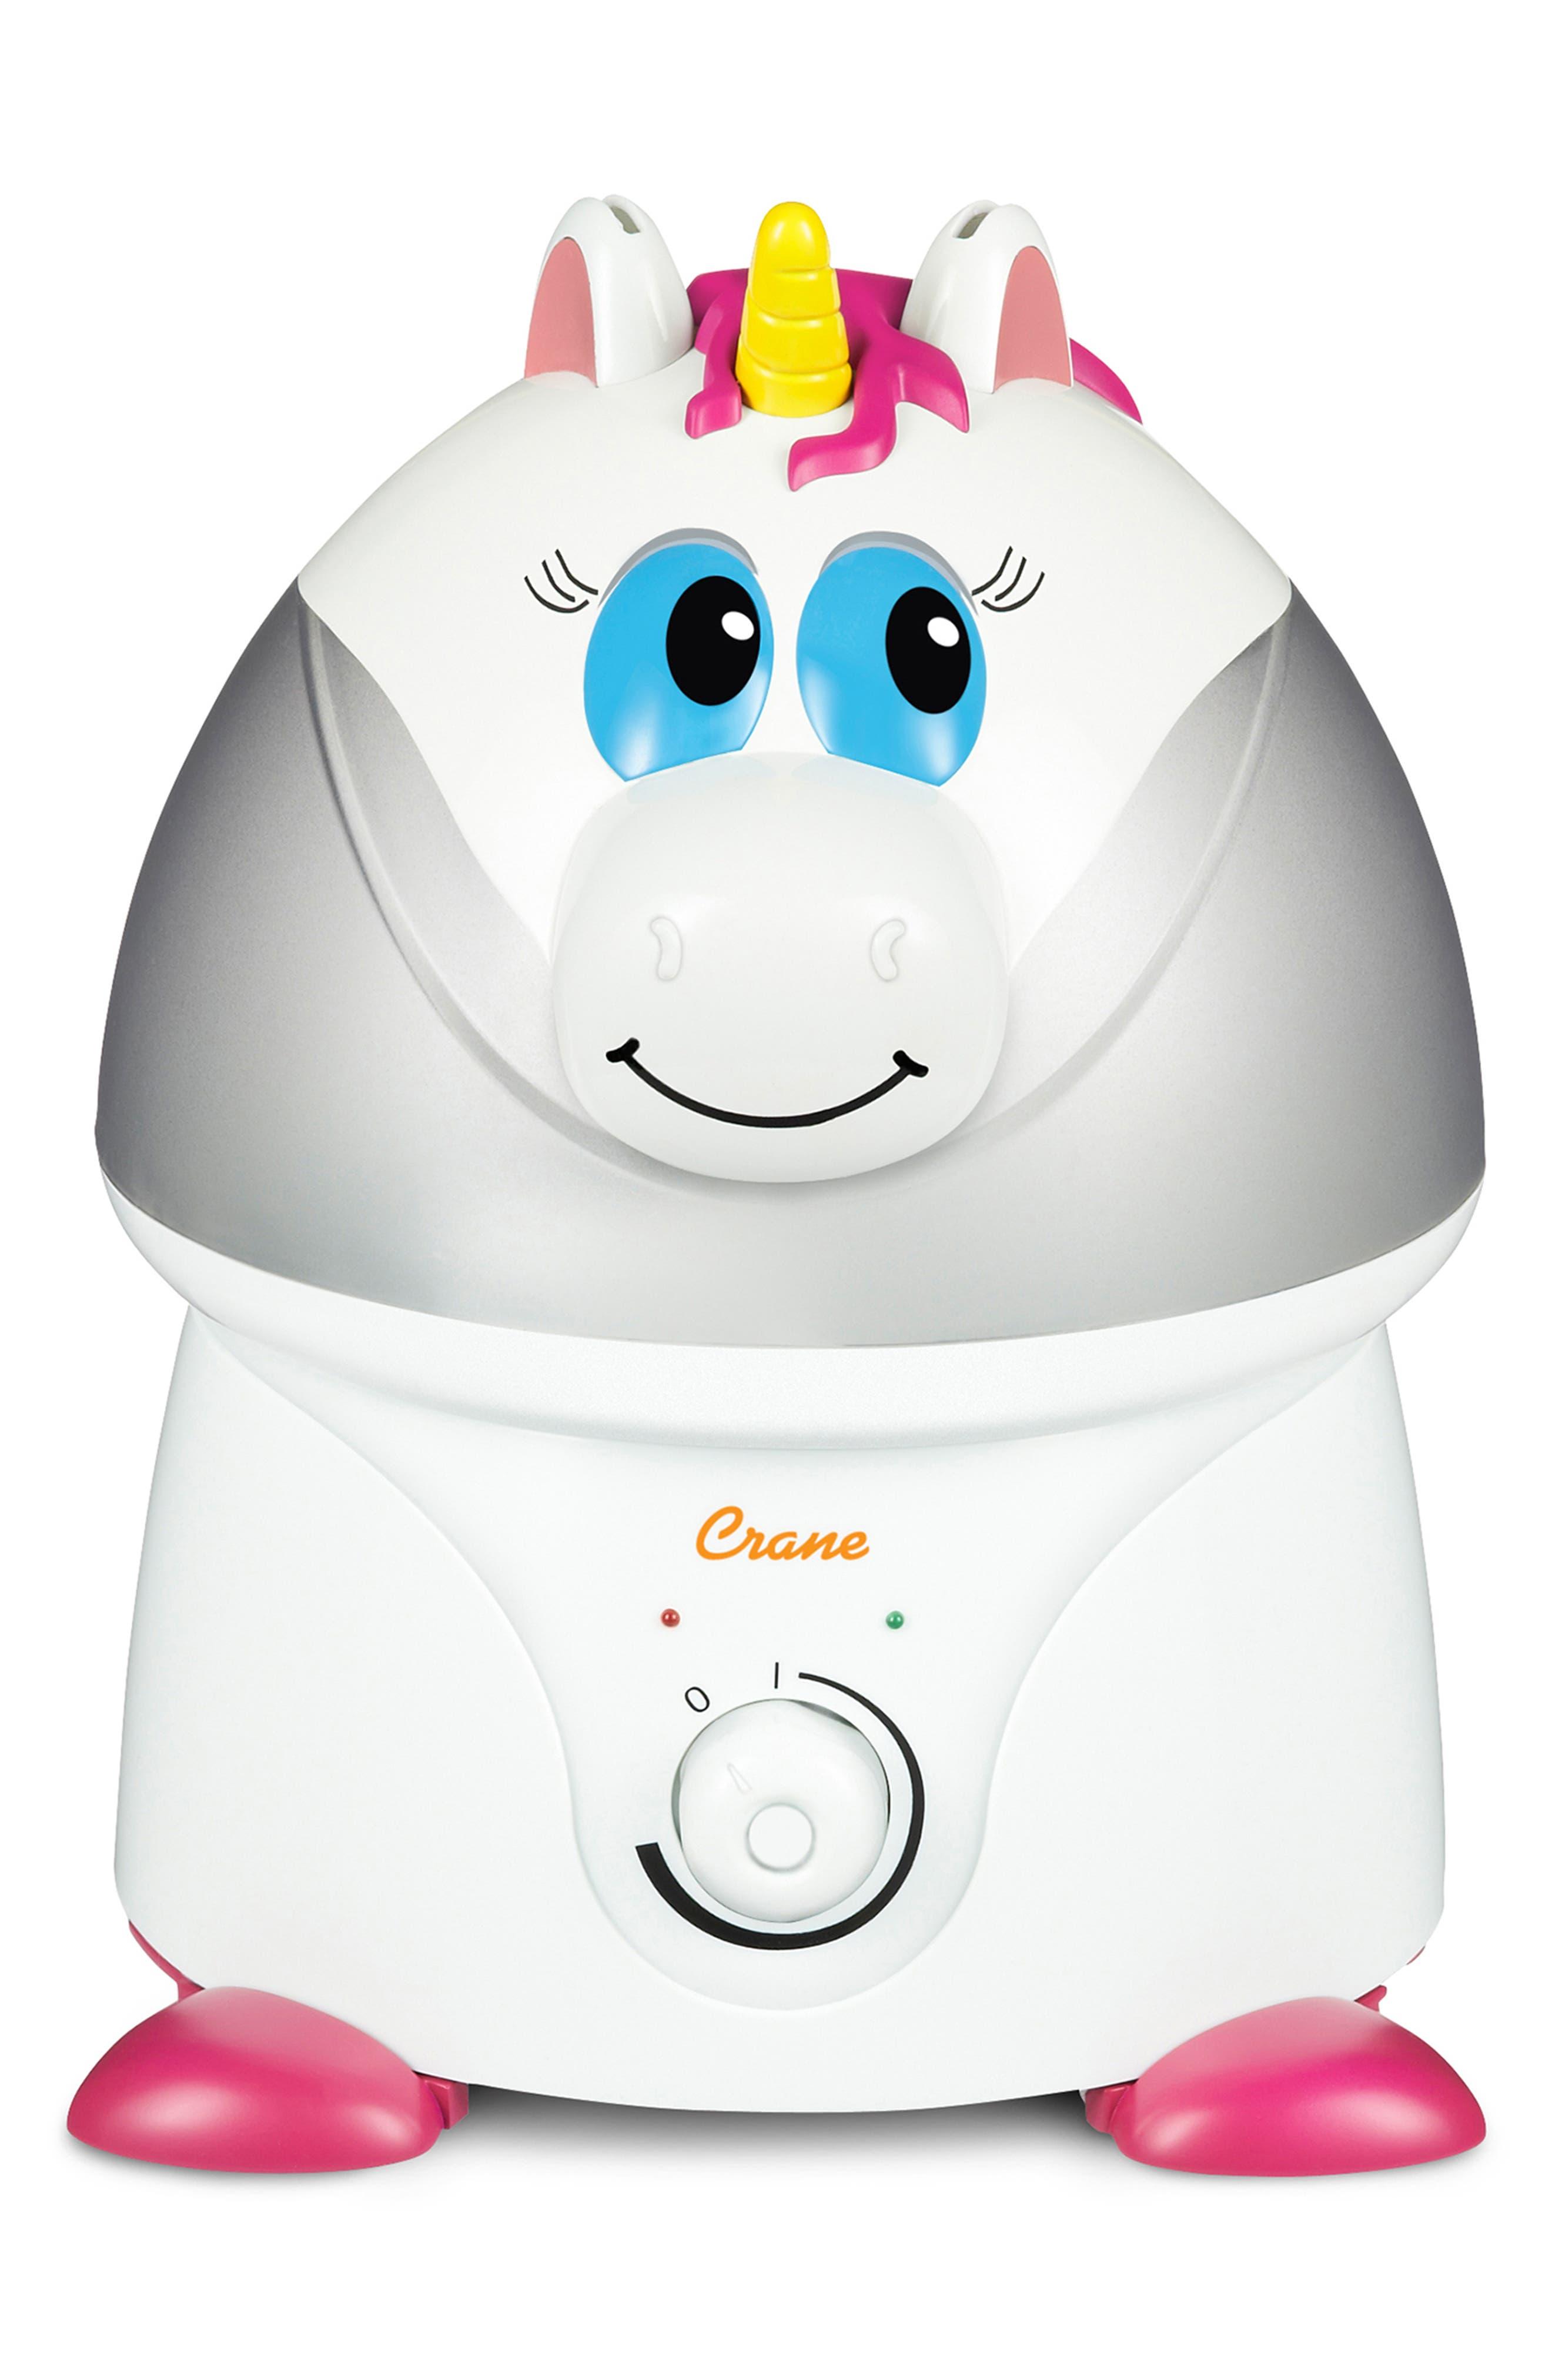 CRANE AIR Unicorn Ultrasonic Cool-Mist Humidifier, Main, color, WHITE